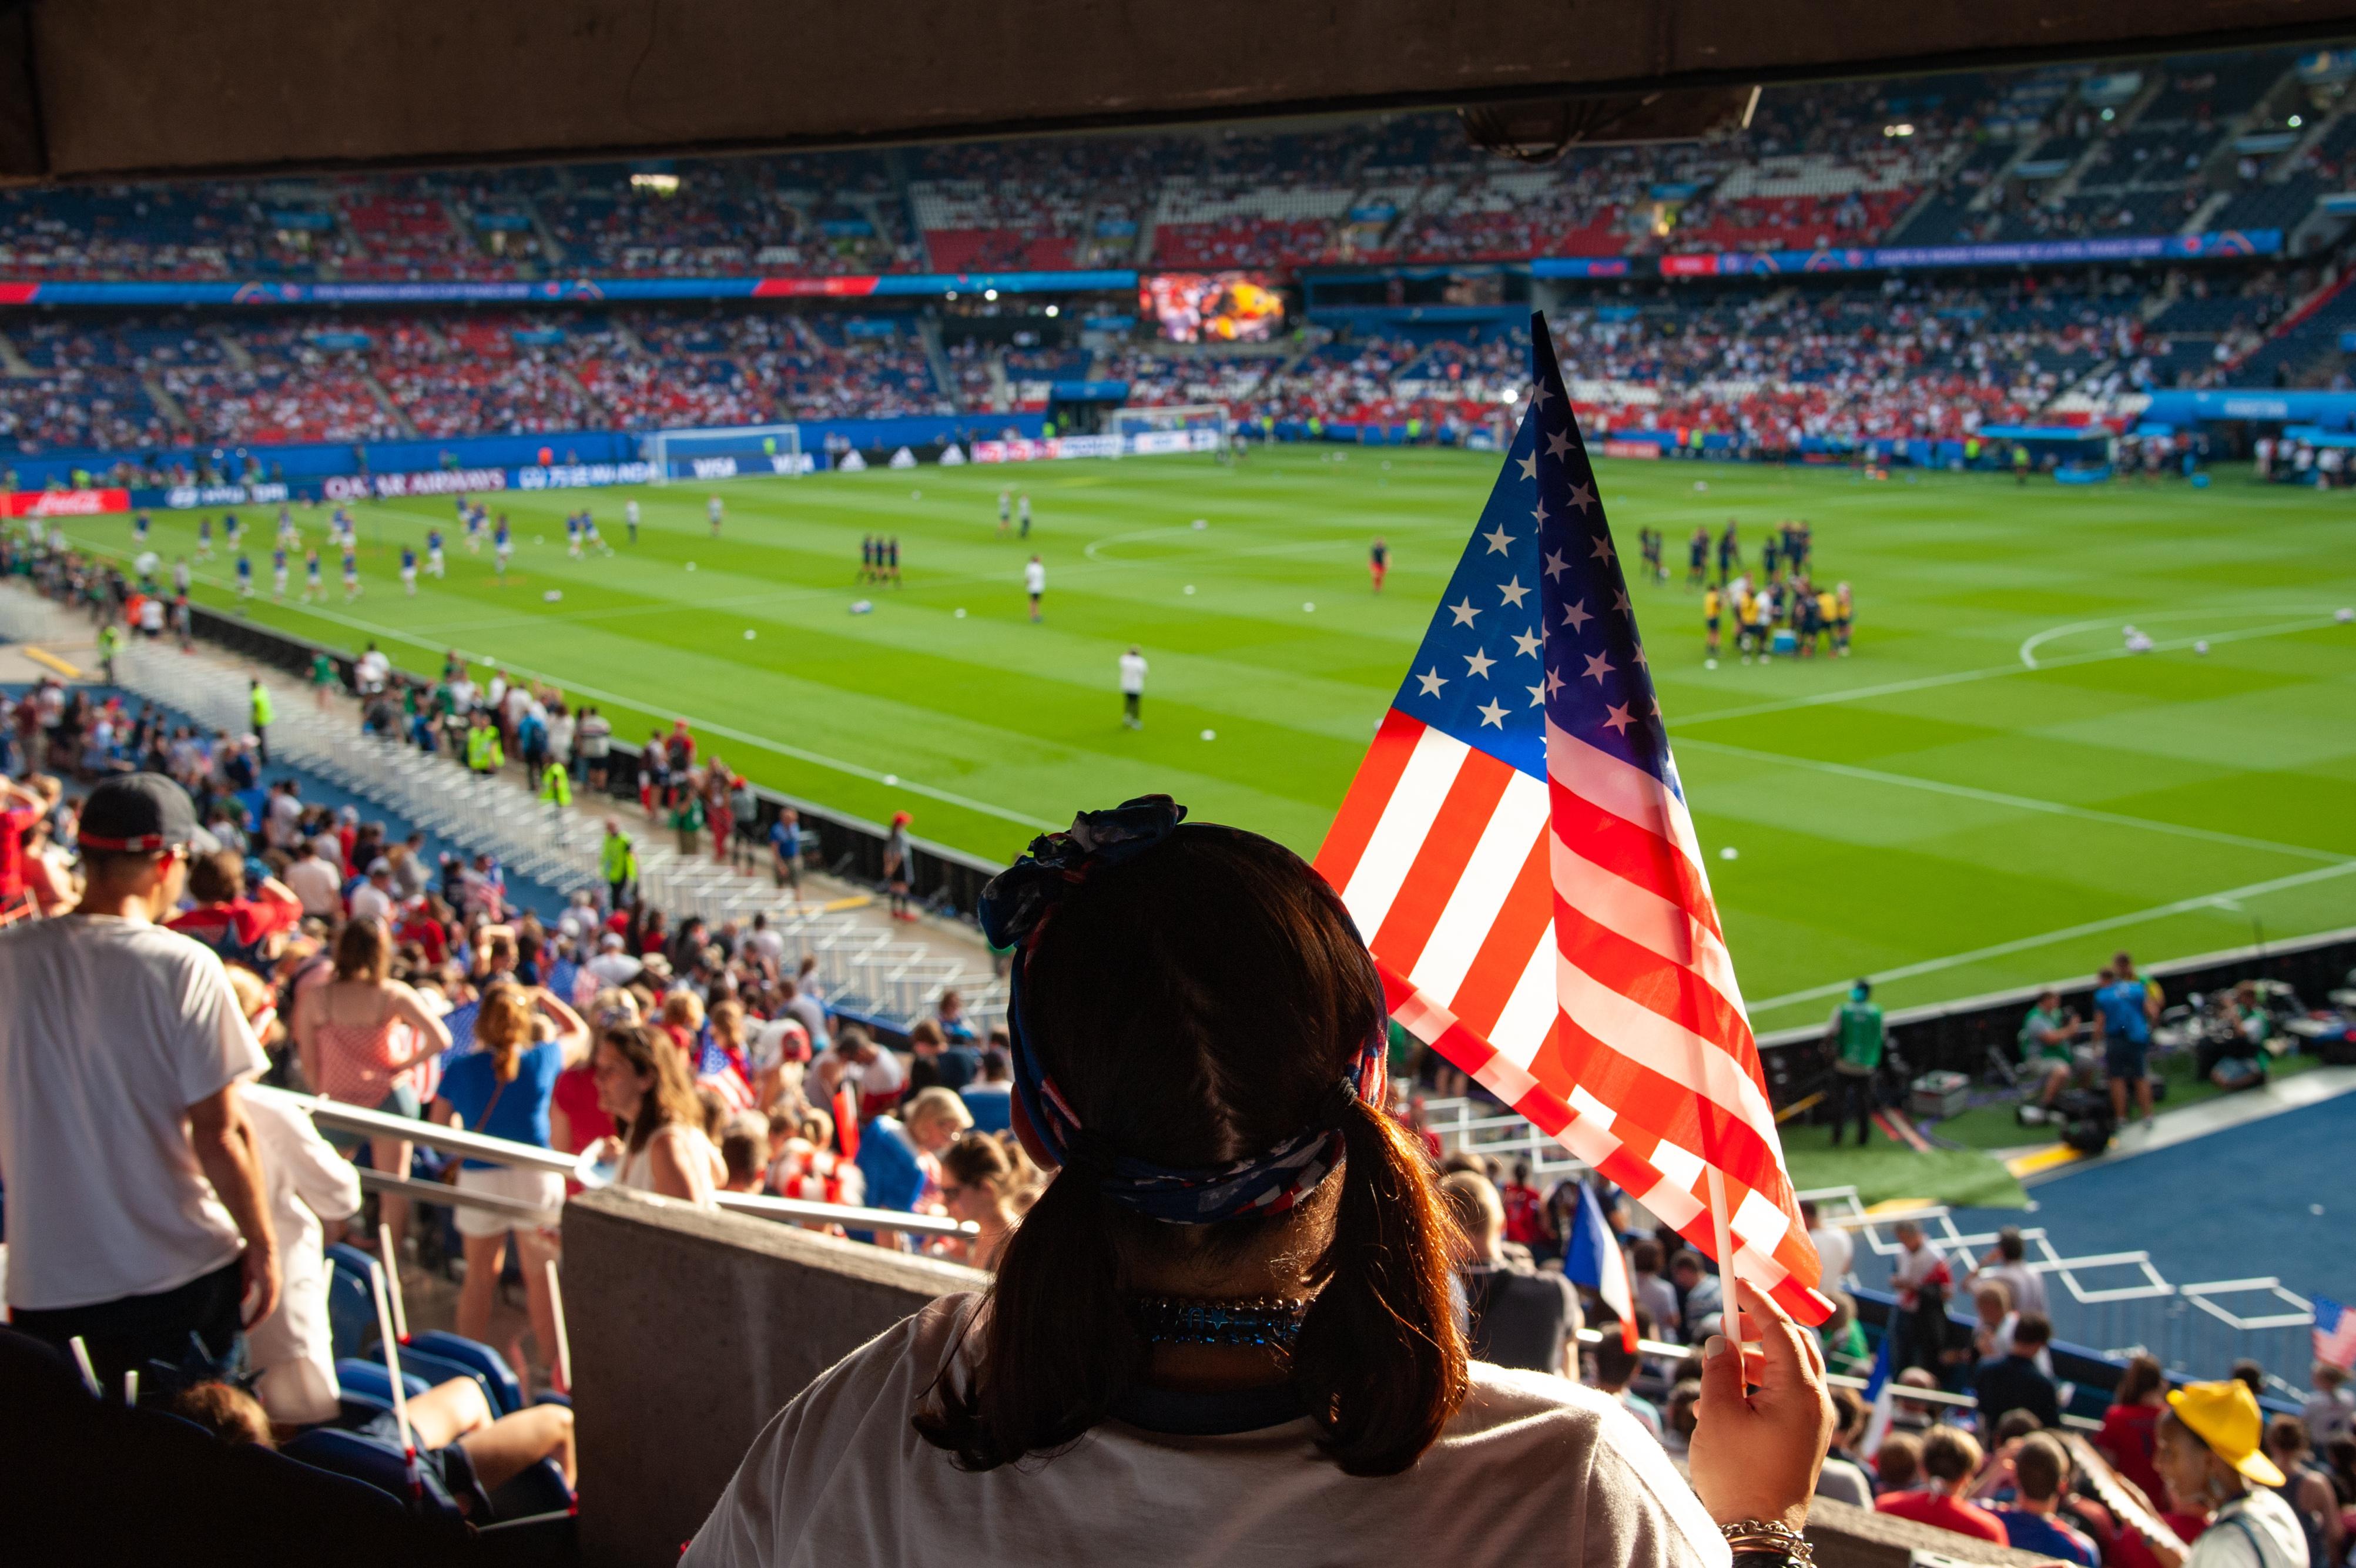 The U.S. Women's soccer team deserves equal pay